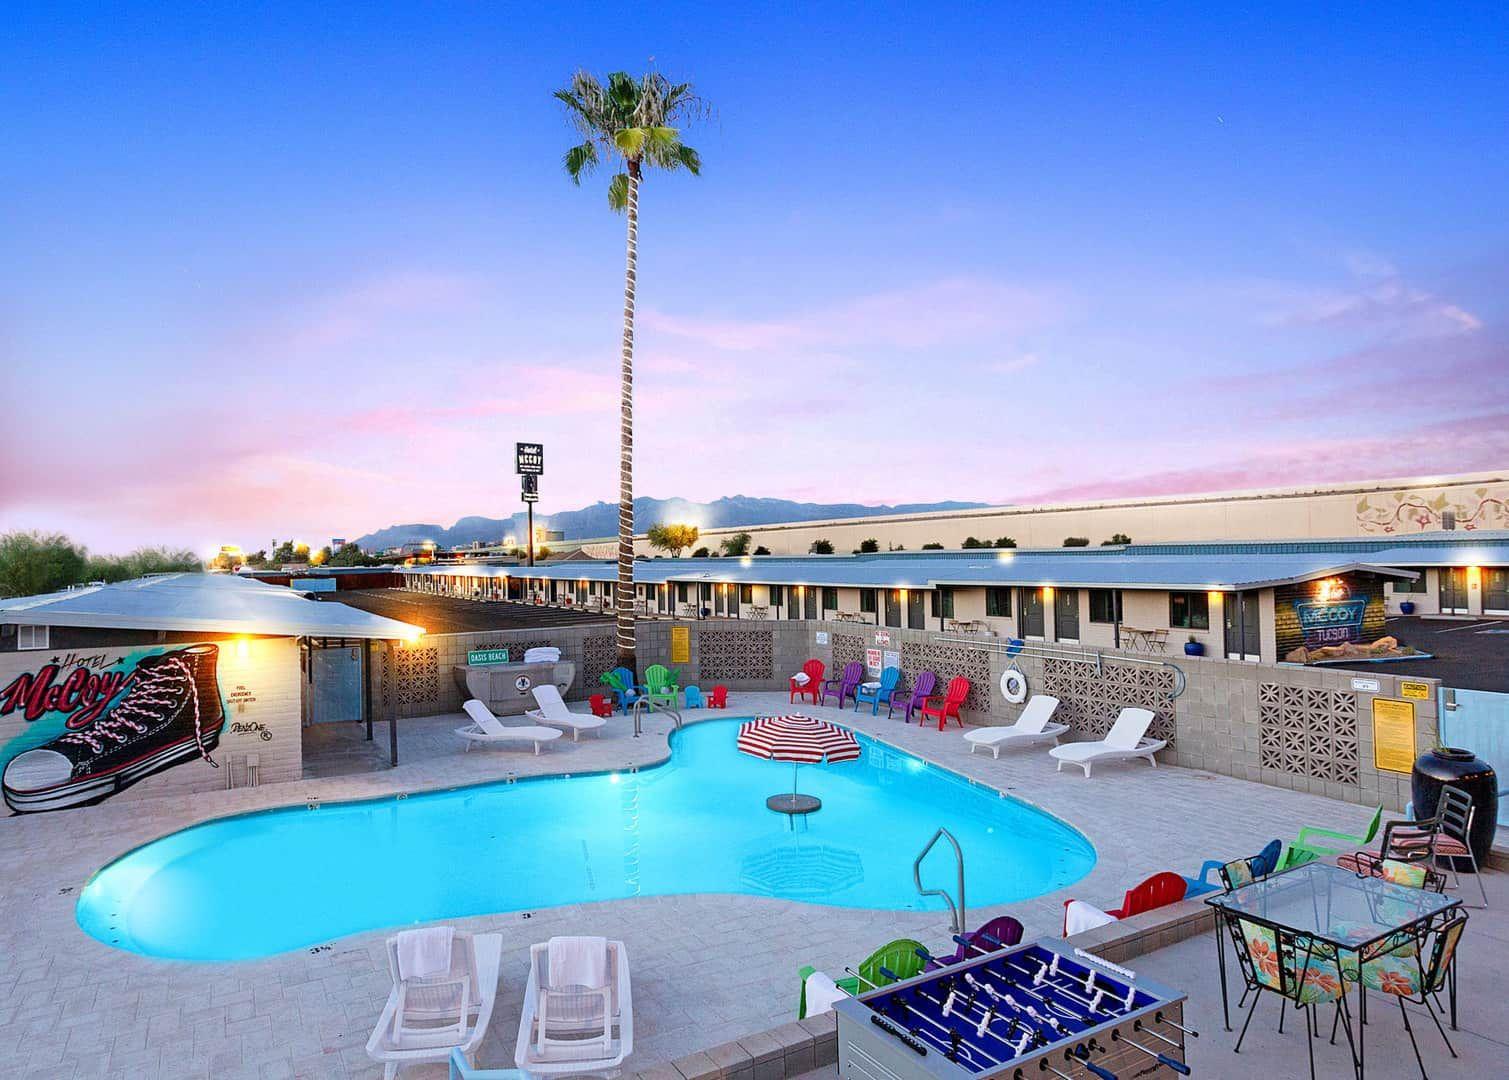 Canyon Ranch   Luxury Hotel in Tucson Arizona